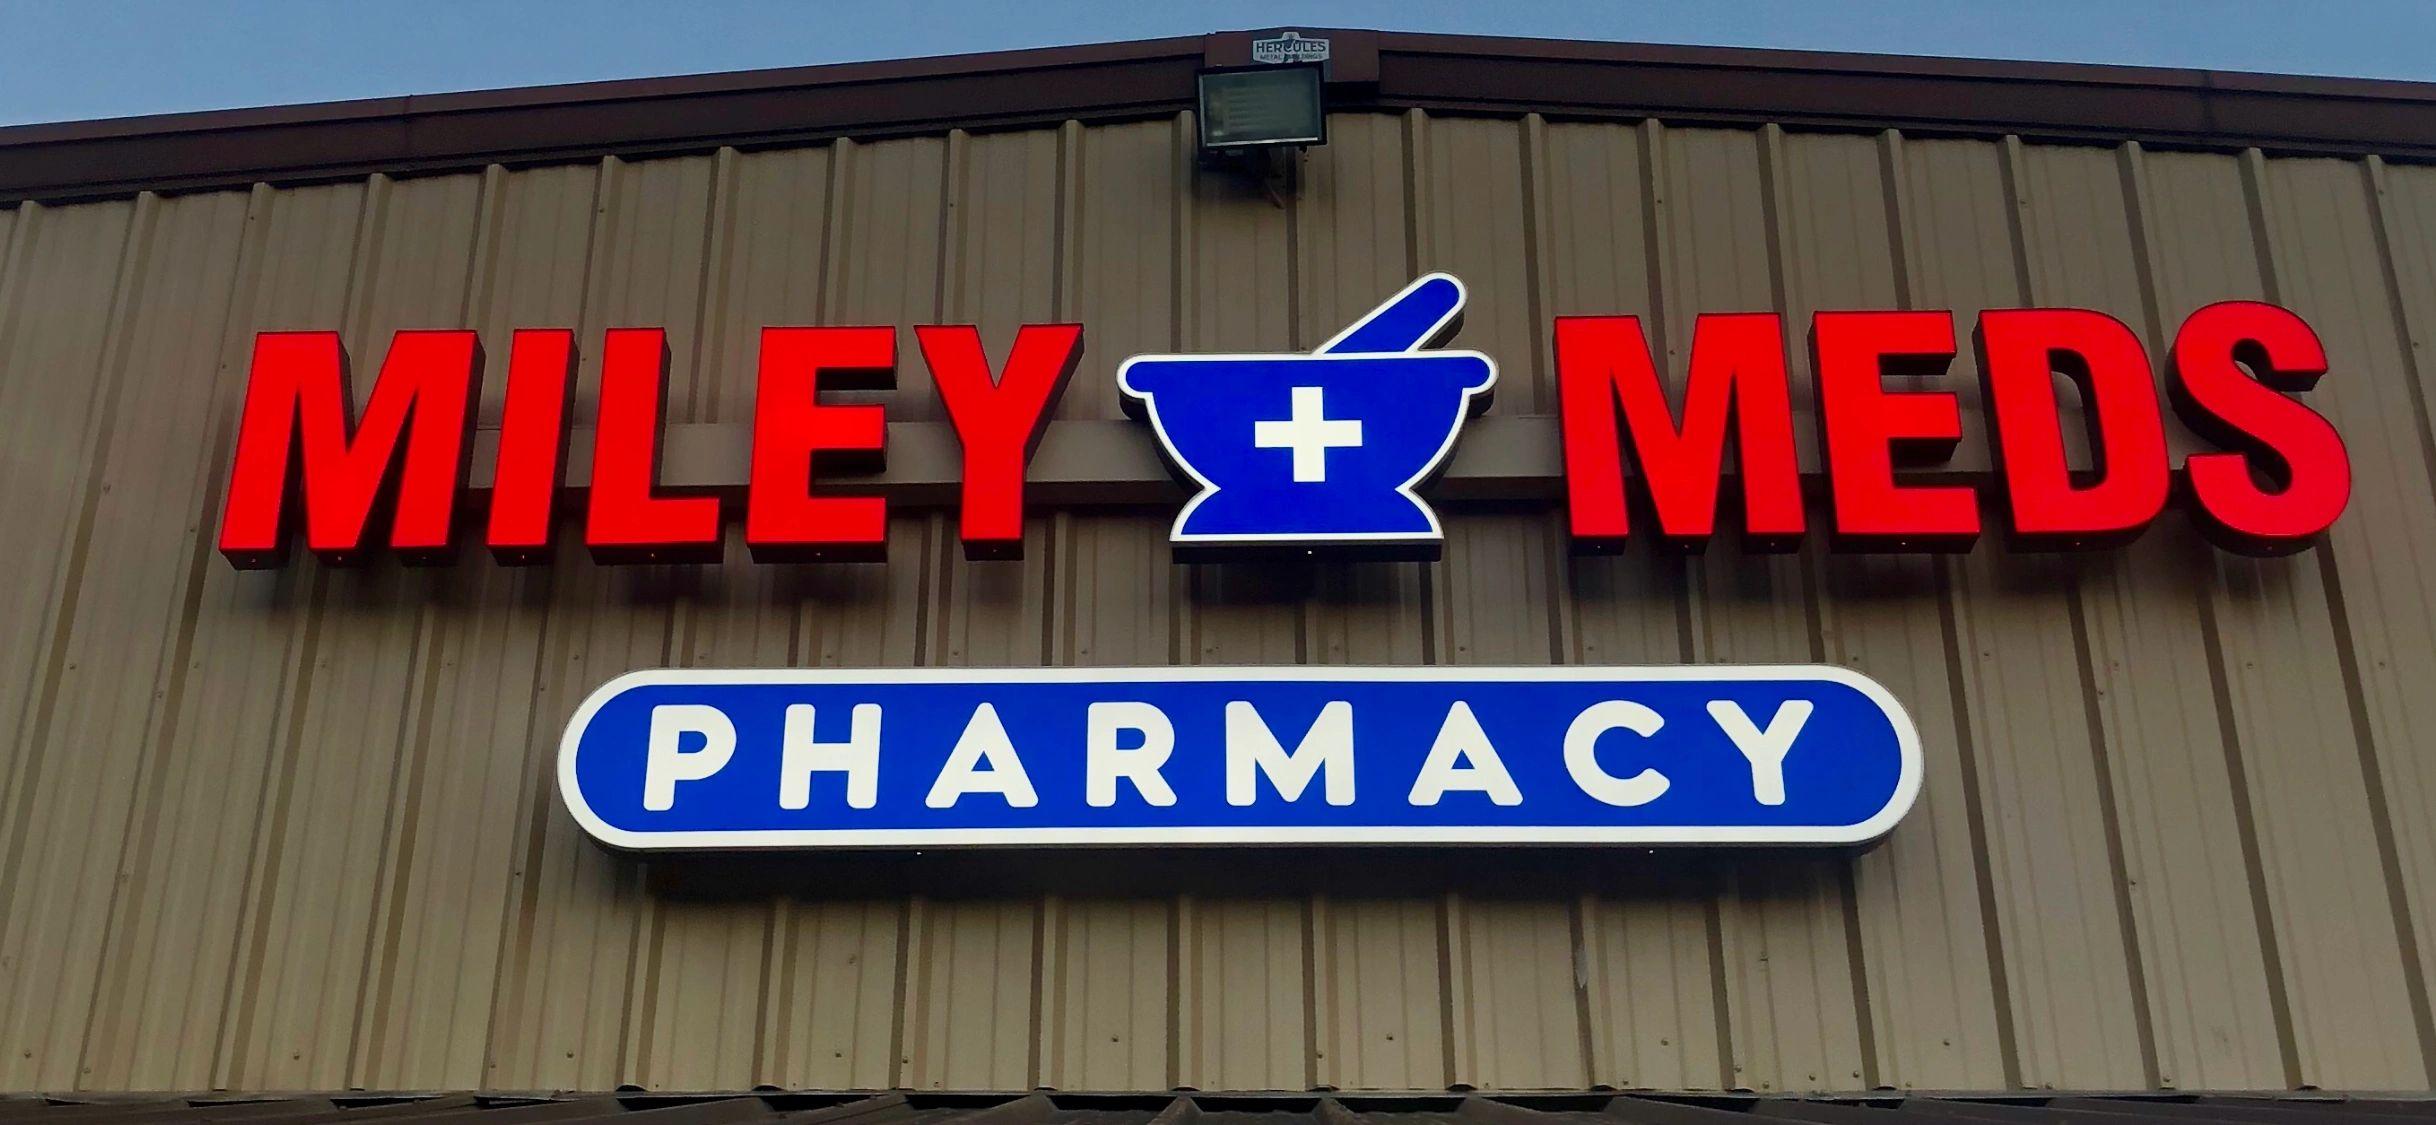 Miley Meds Pharmacy Pharmacy Services Pearl River